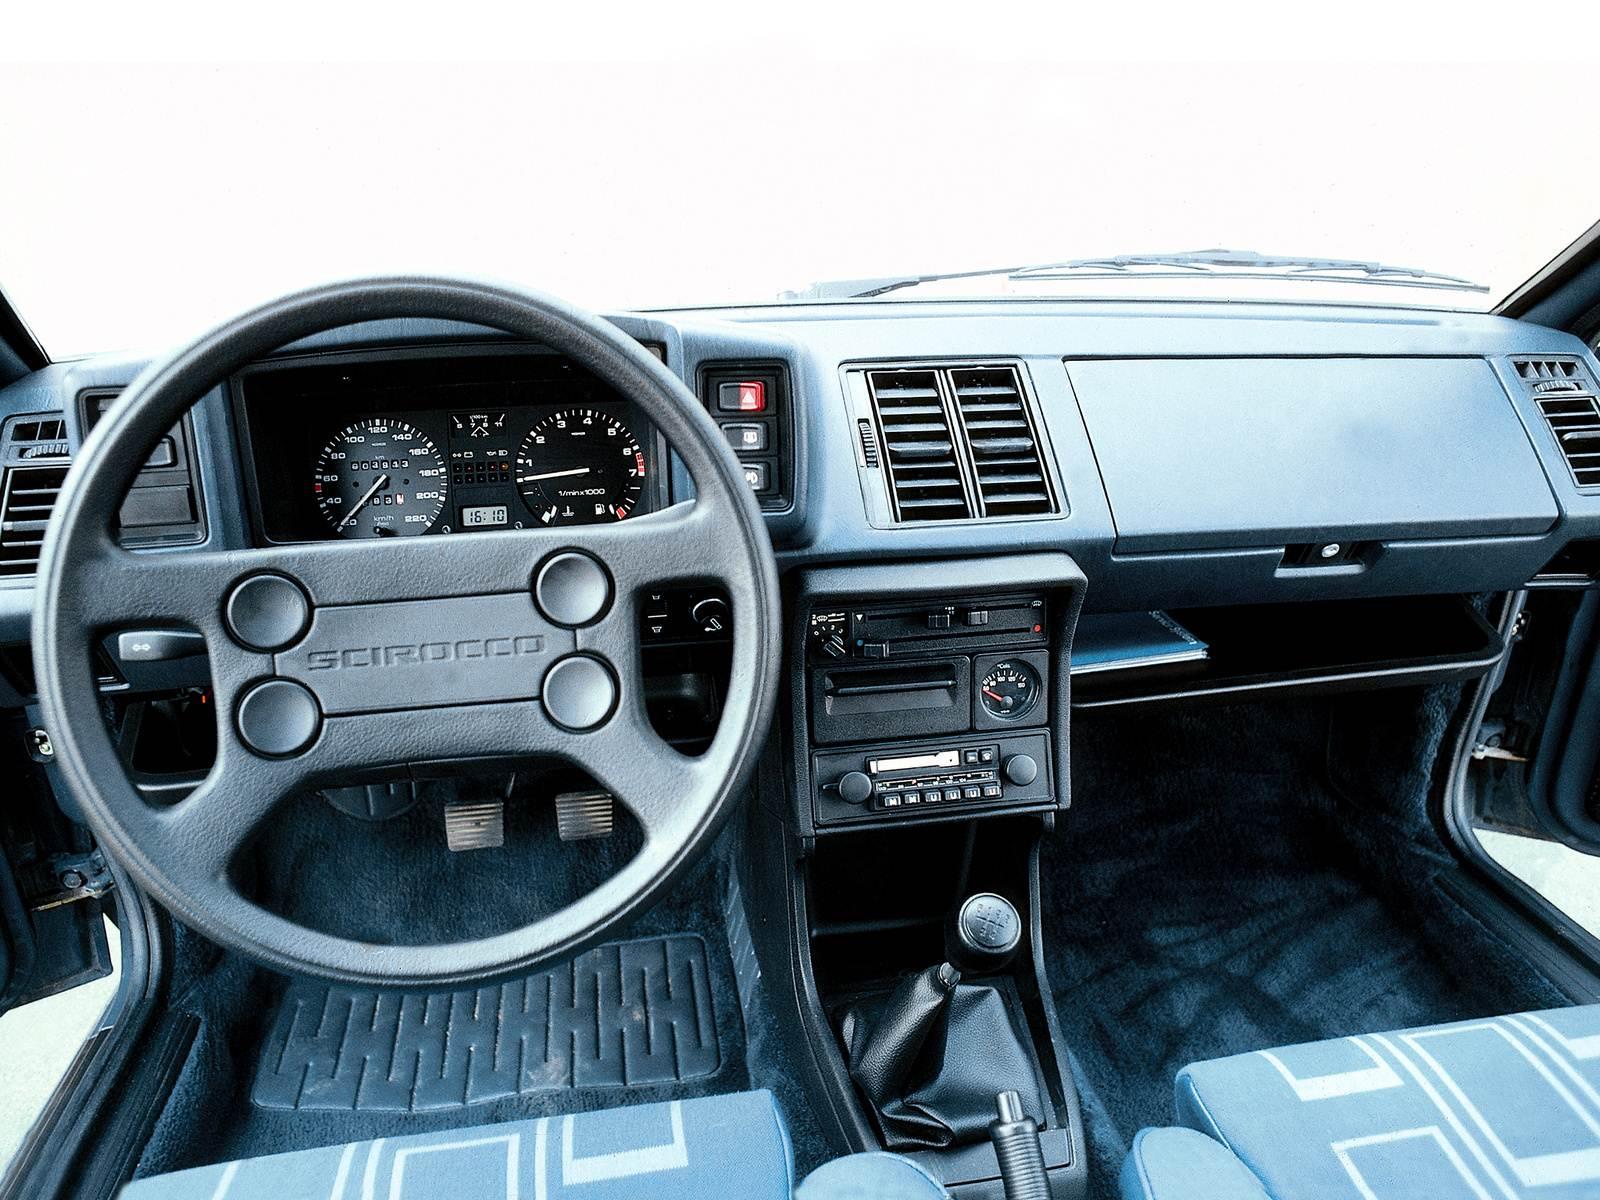 1985 Volkswagen Scirocco Interor